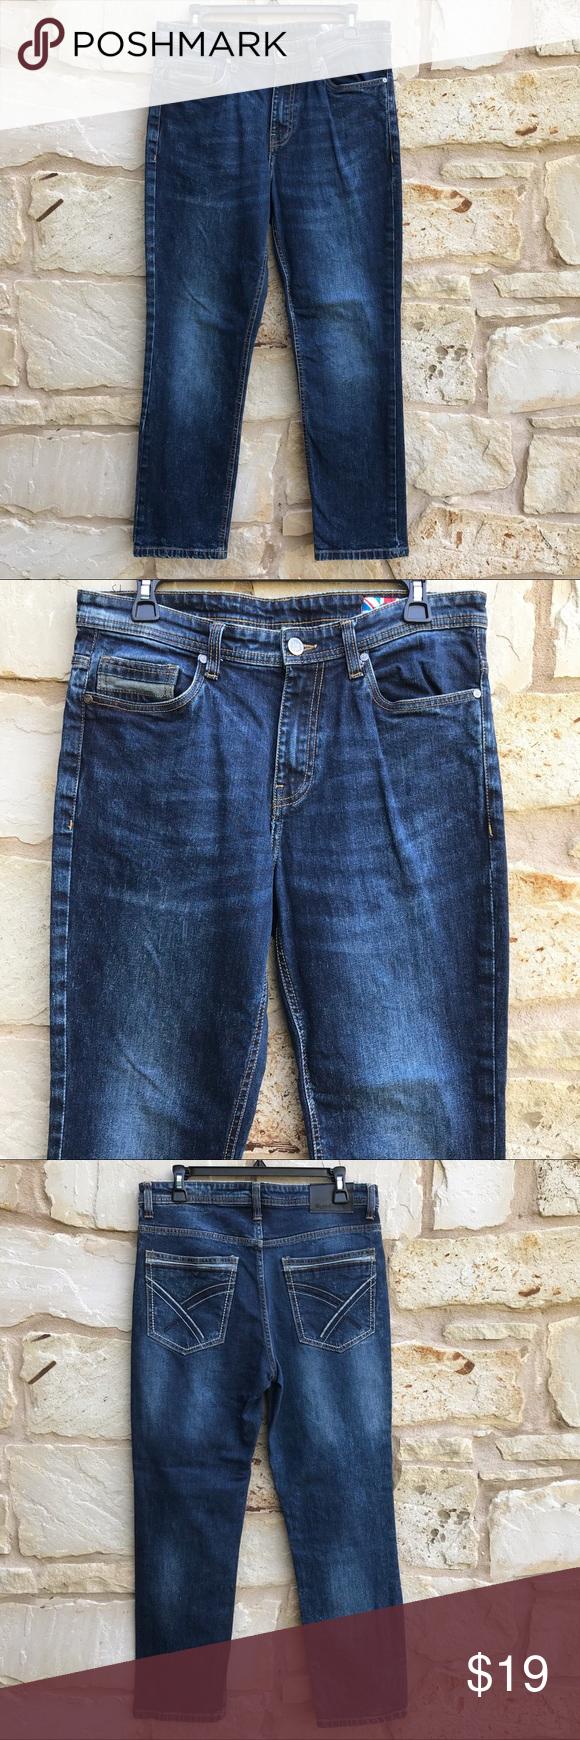 English Laundry Dark Straight Leg Jeans 30 X 30 English Laundry